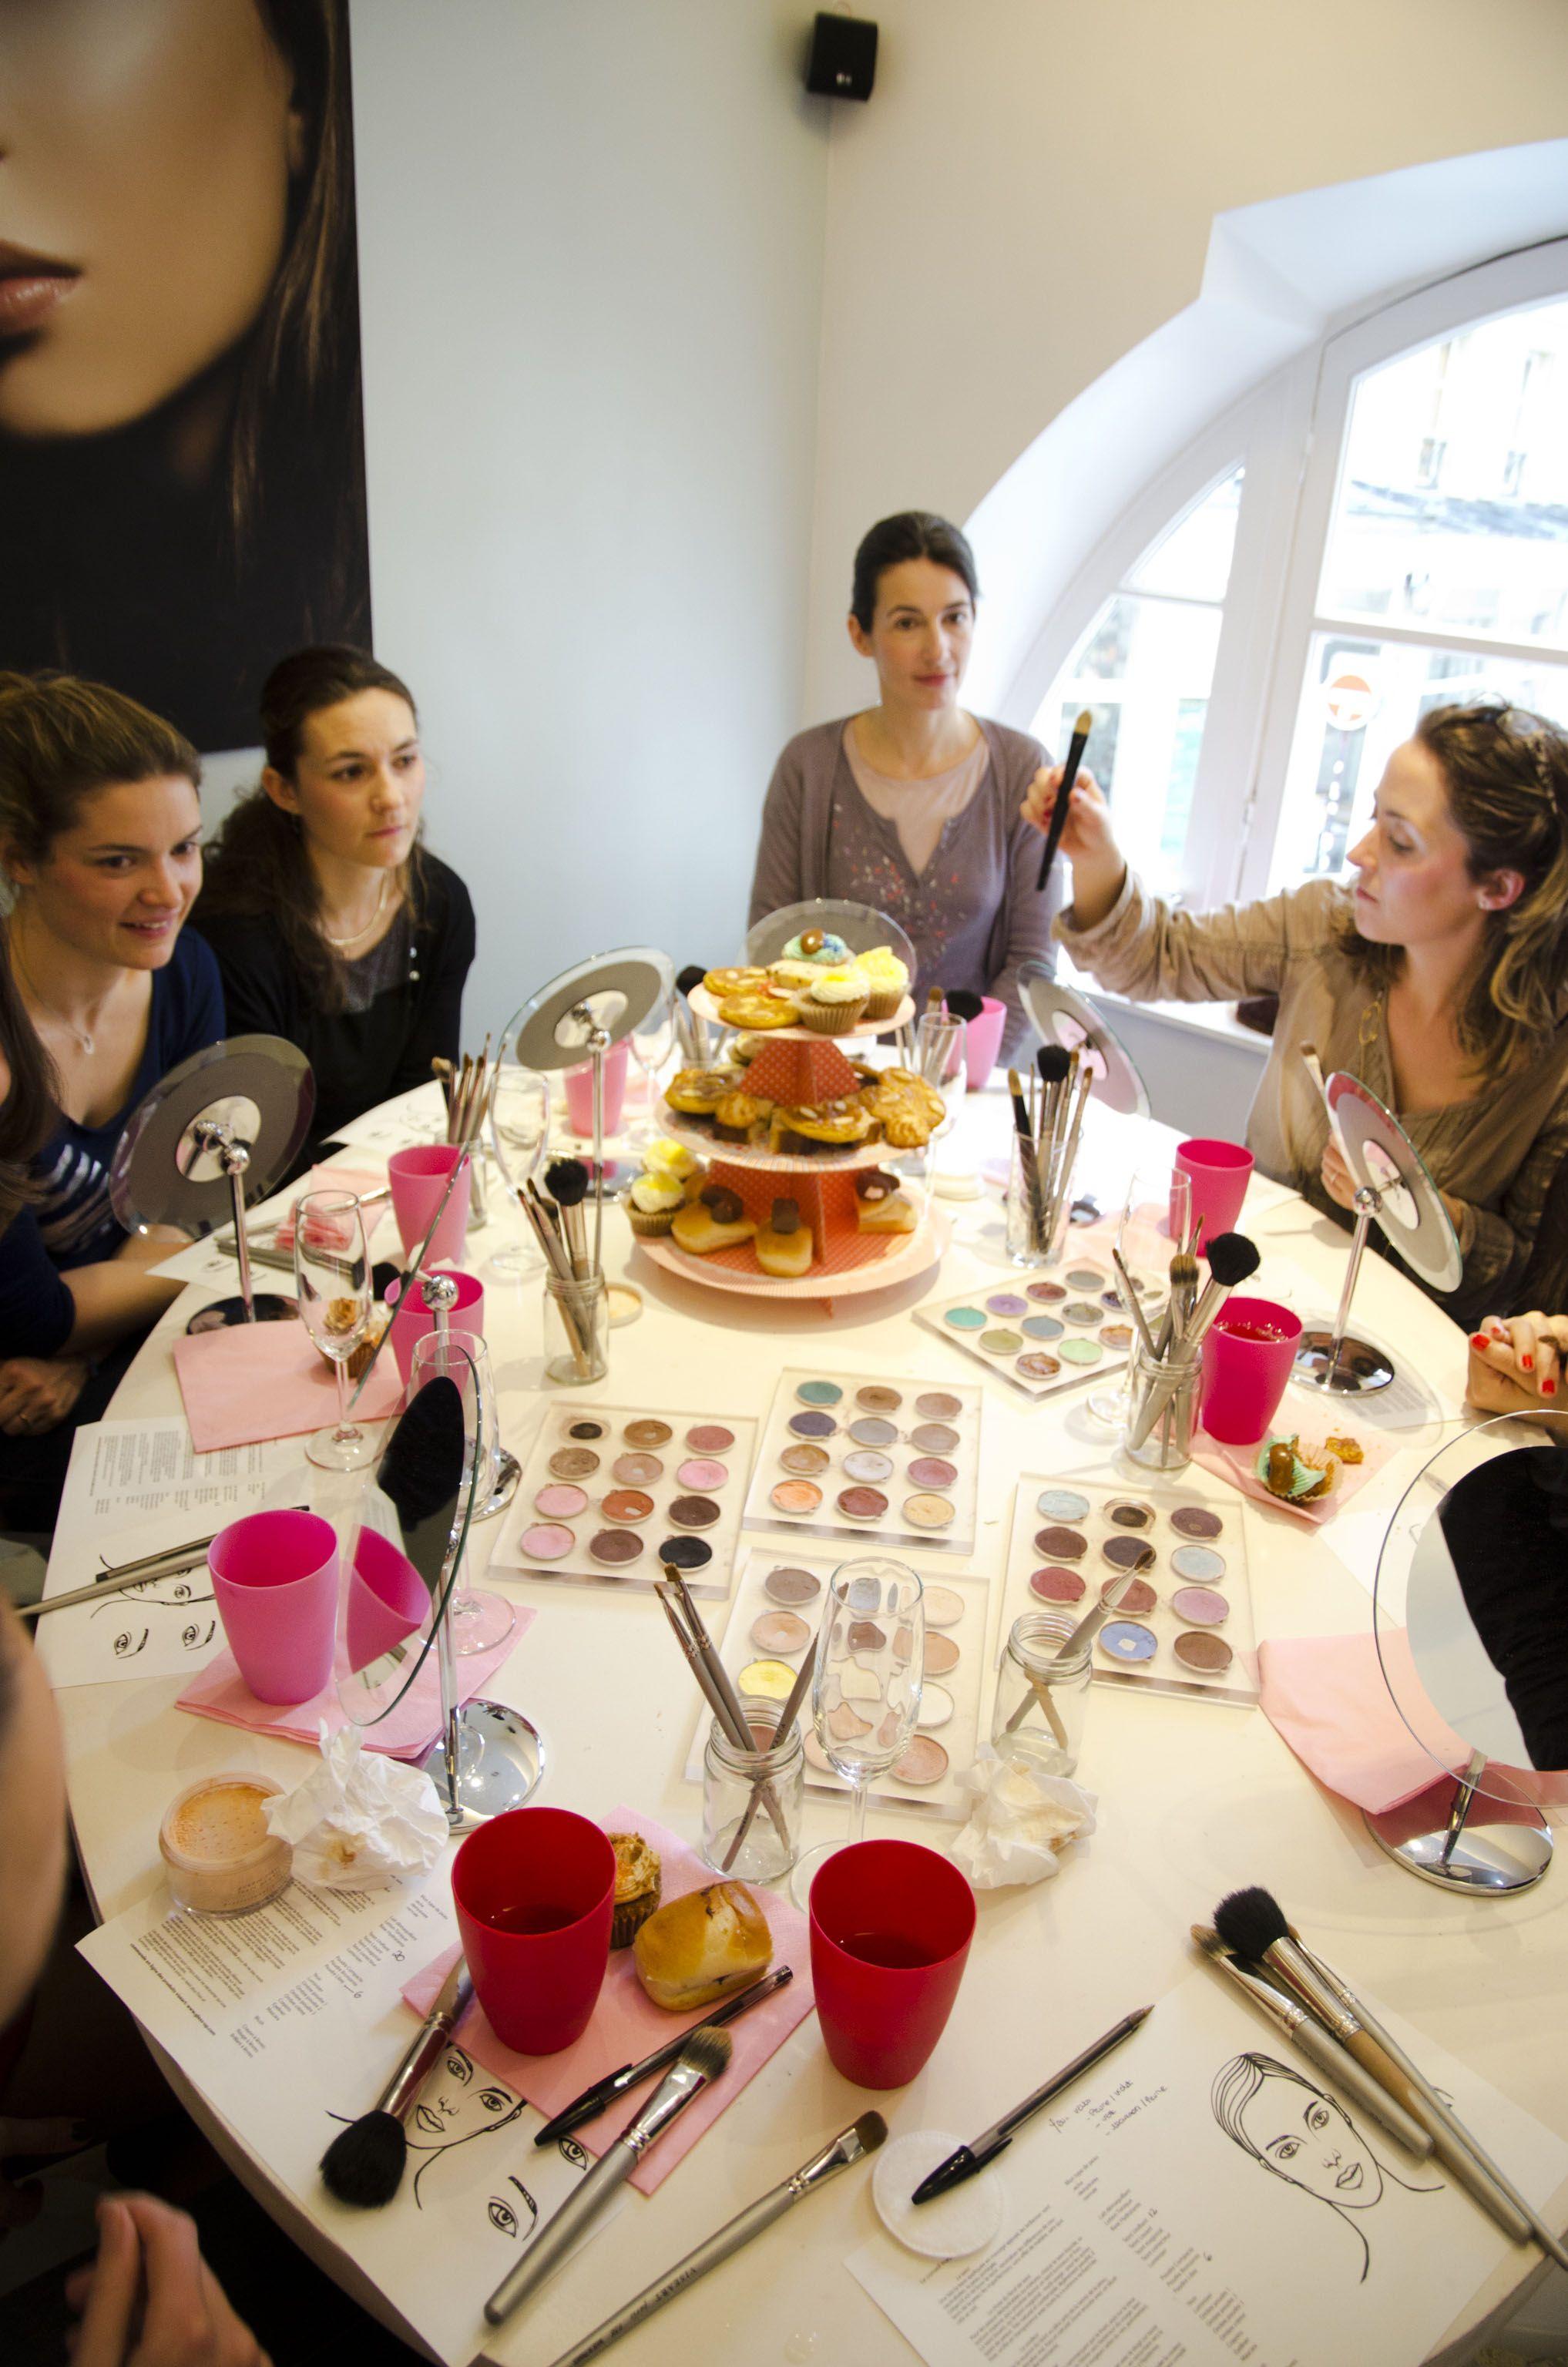 Idees D Activites Atelier Maquillage Entre Copines Evjf